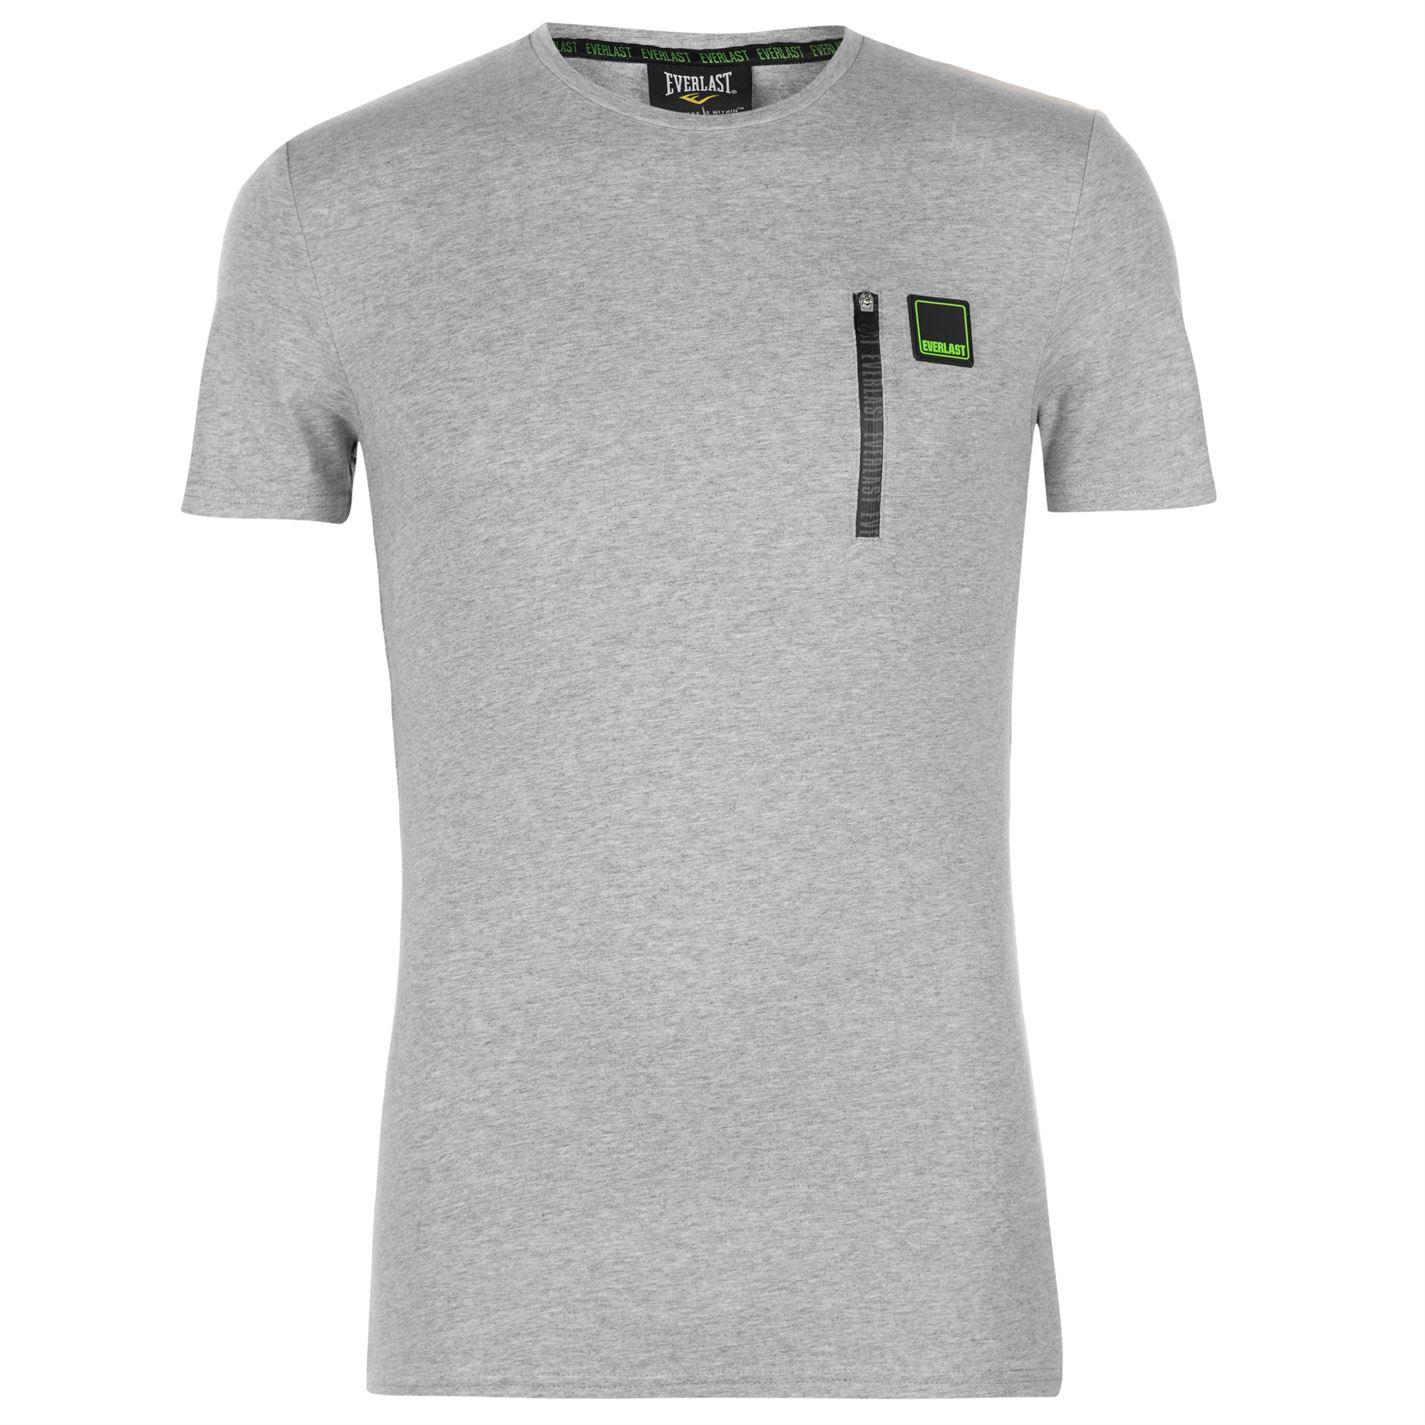 60c0708fca0b Tričko s krátkým rukávem Everlast Premium T Shirt Mens - Glami.cz